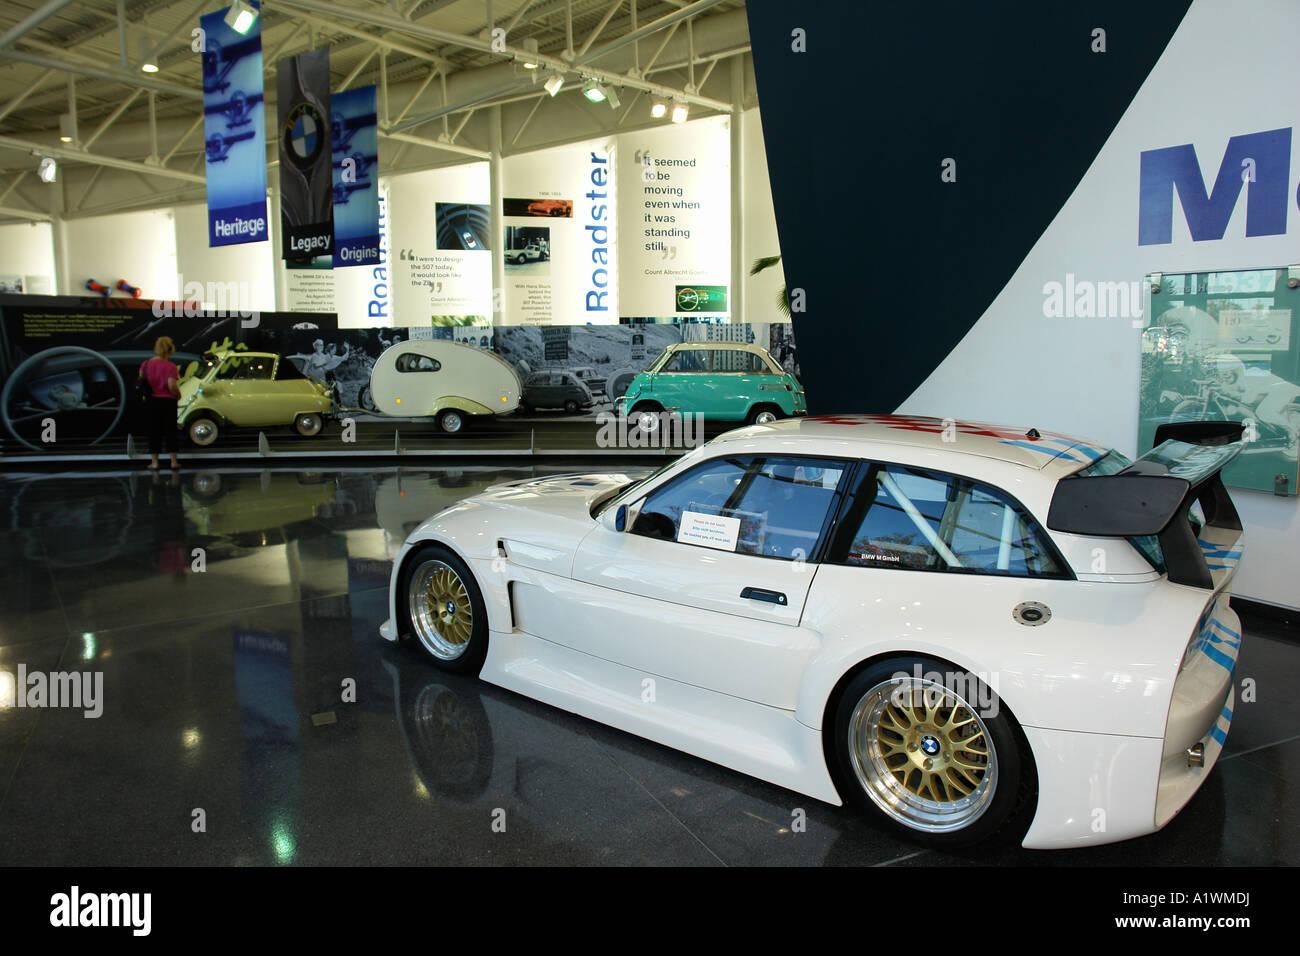 Ajd54357 spartanburg sc south carolina bmw plant zentrum museum factory tours